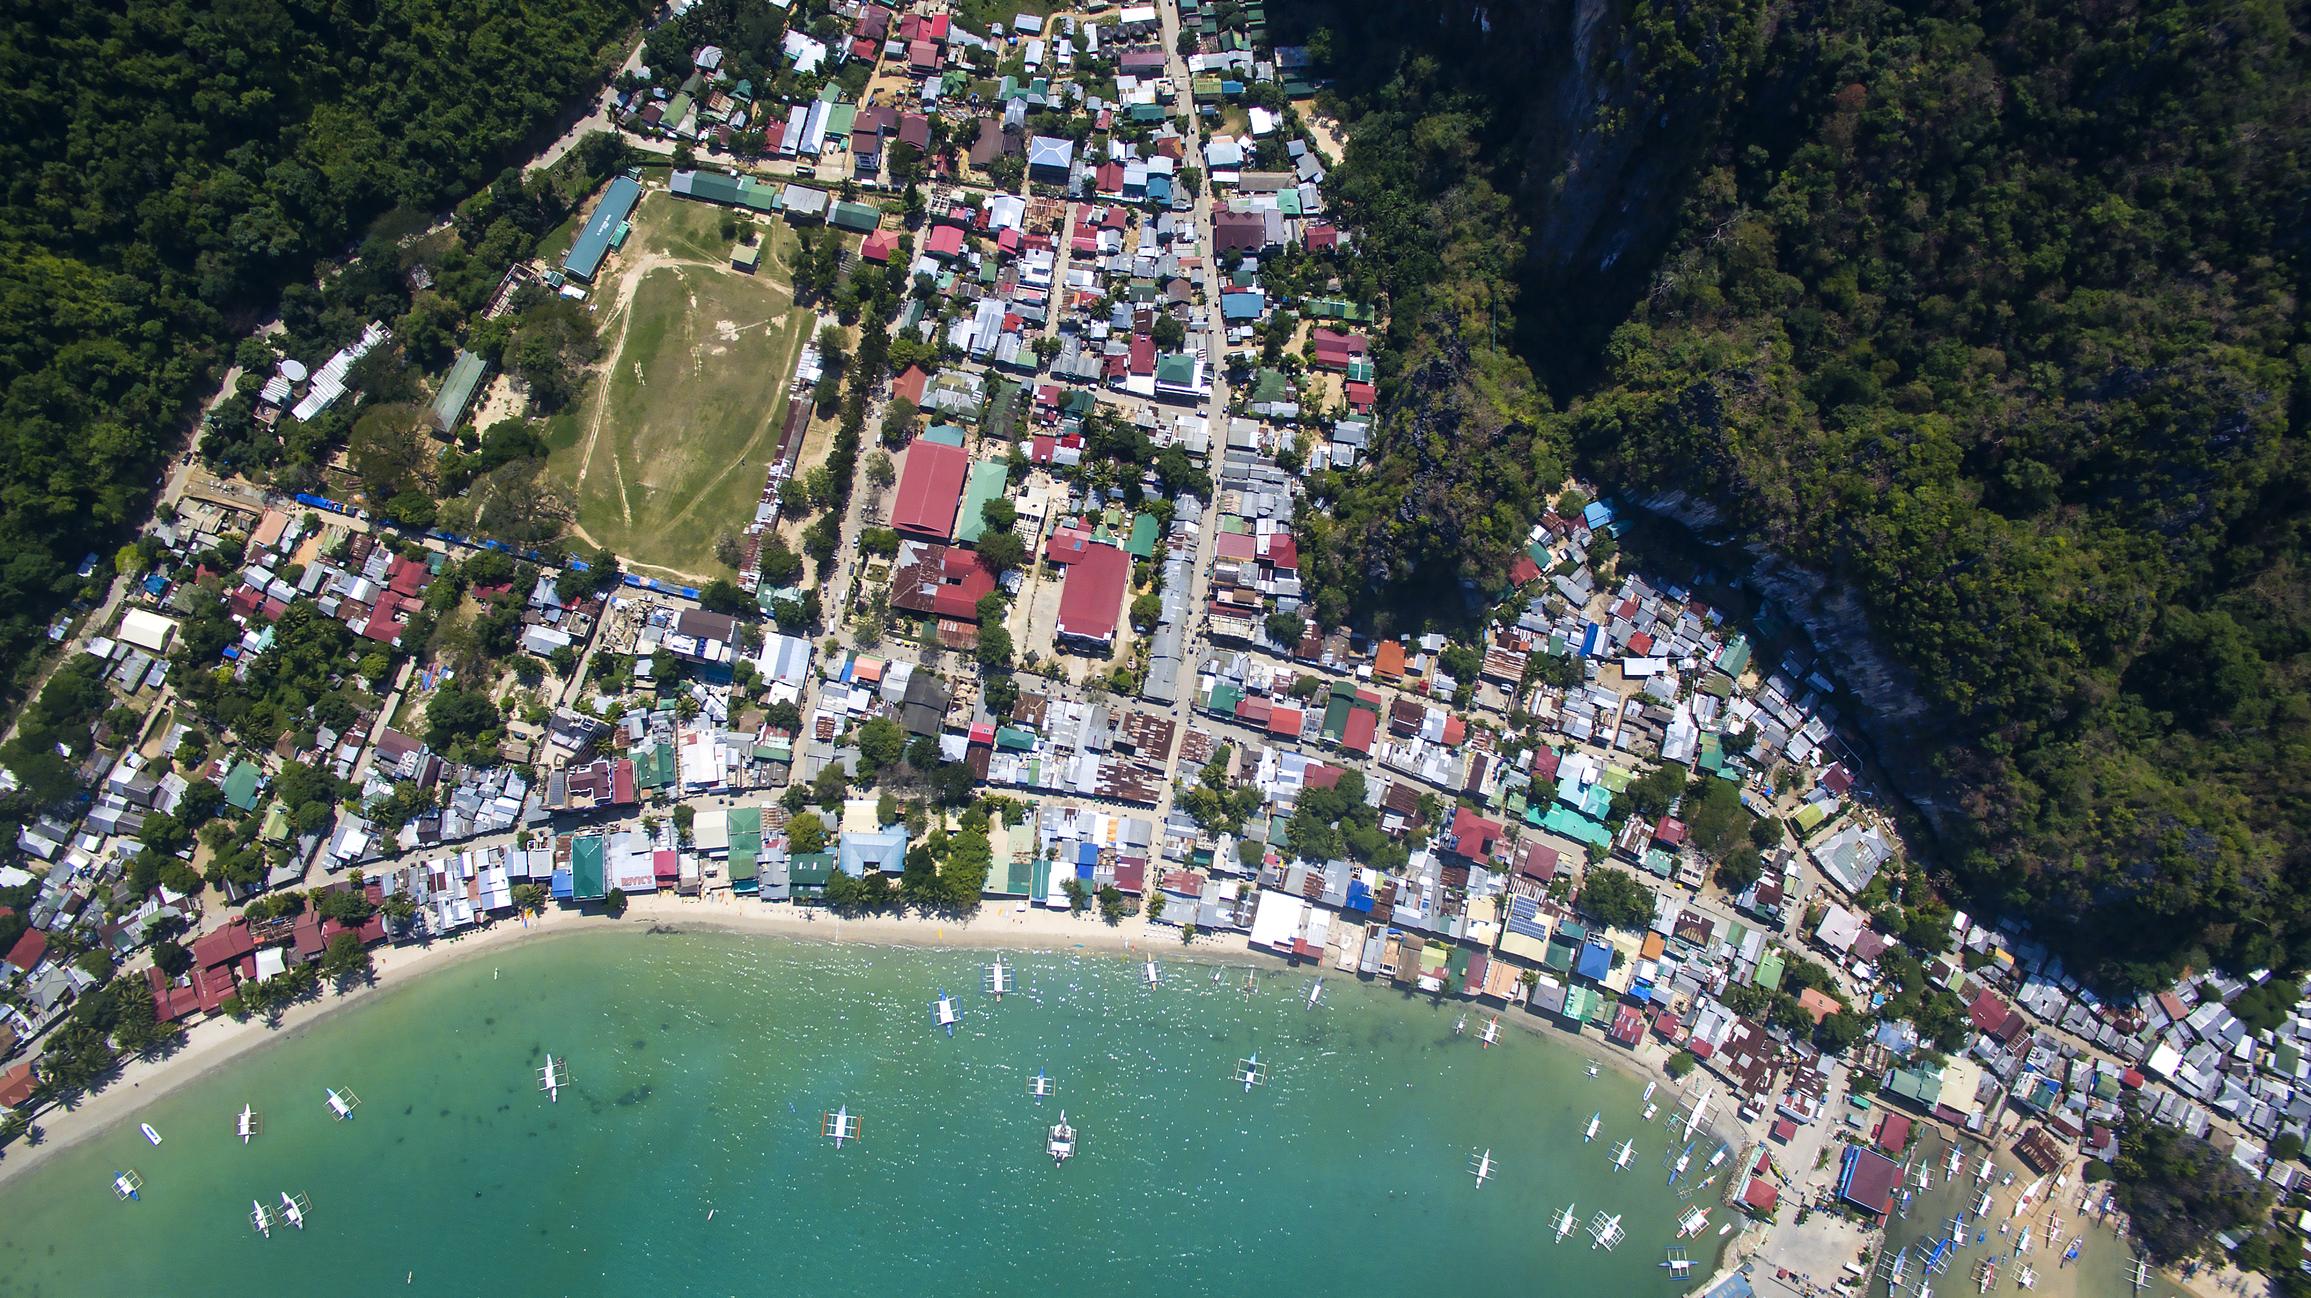 The village of El Nido Palawan Island Philippines